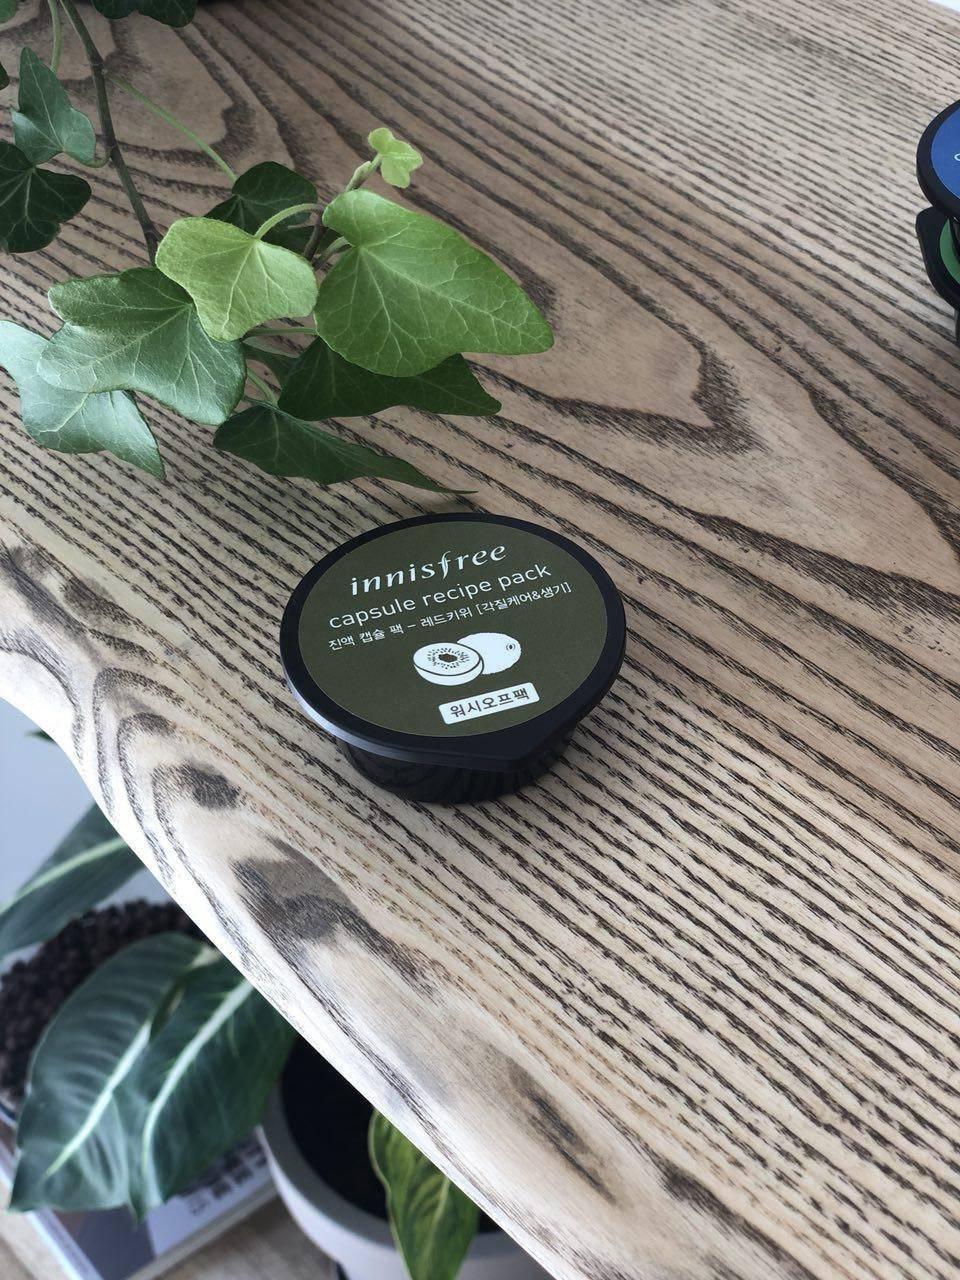 Маска Восстанавливающая С Экстрактом Киви Innisfree Capsule Recipe Pack Red Kiwi